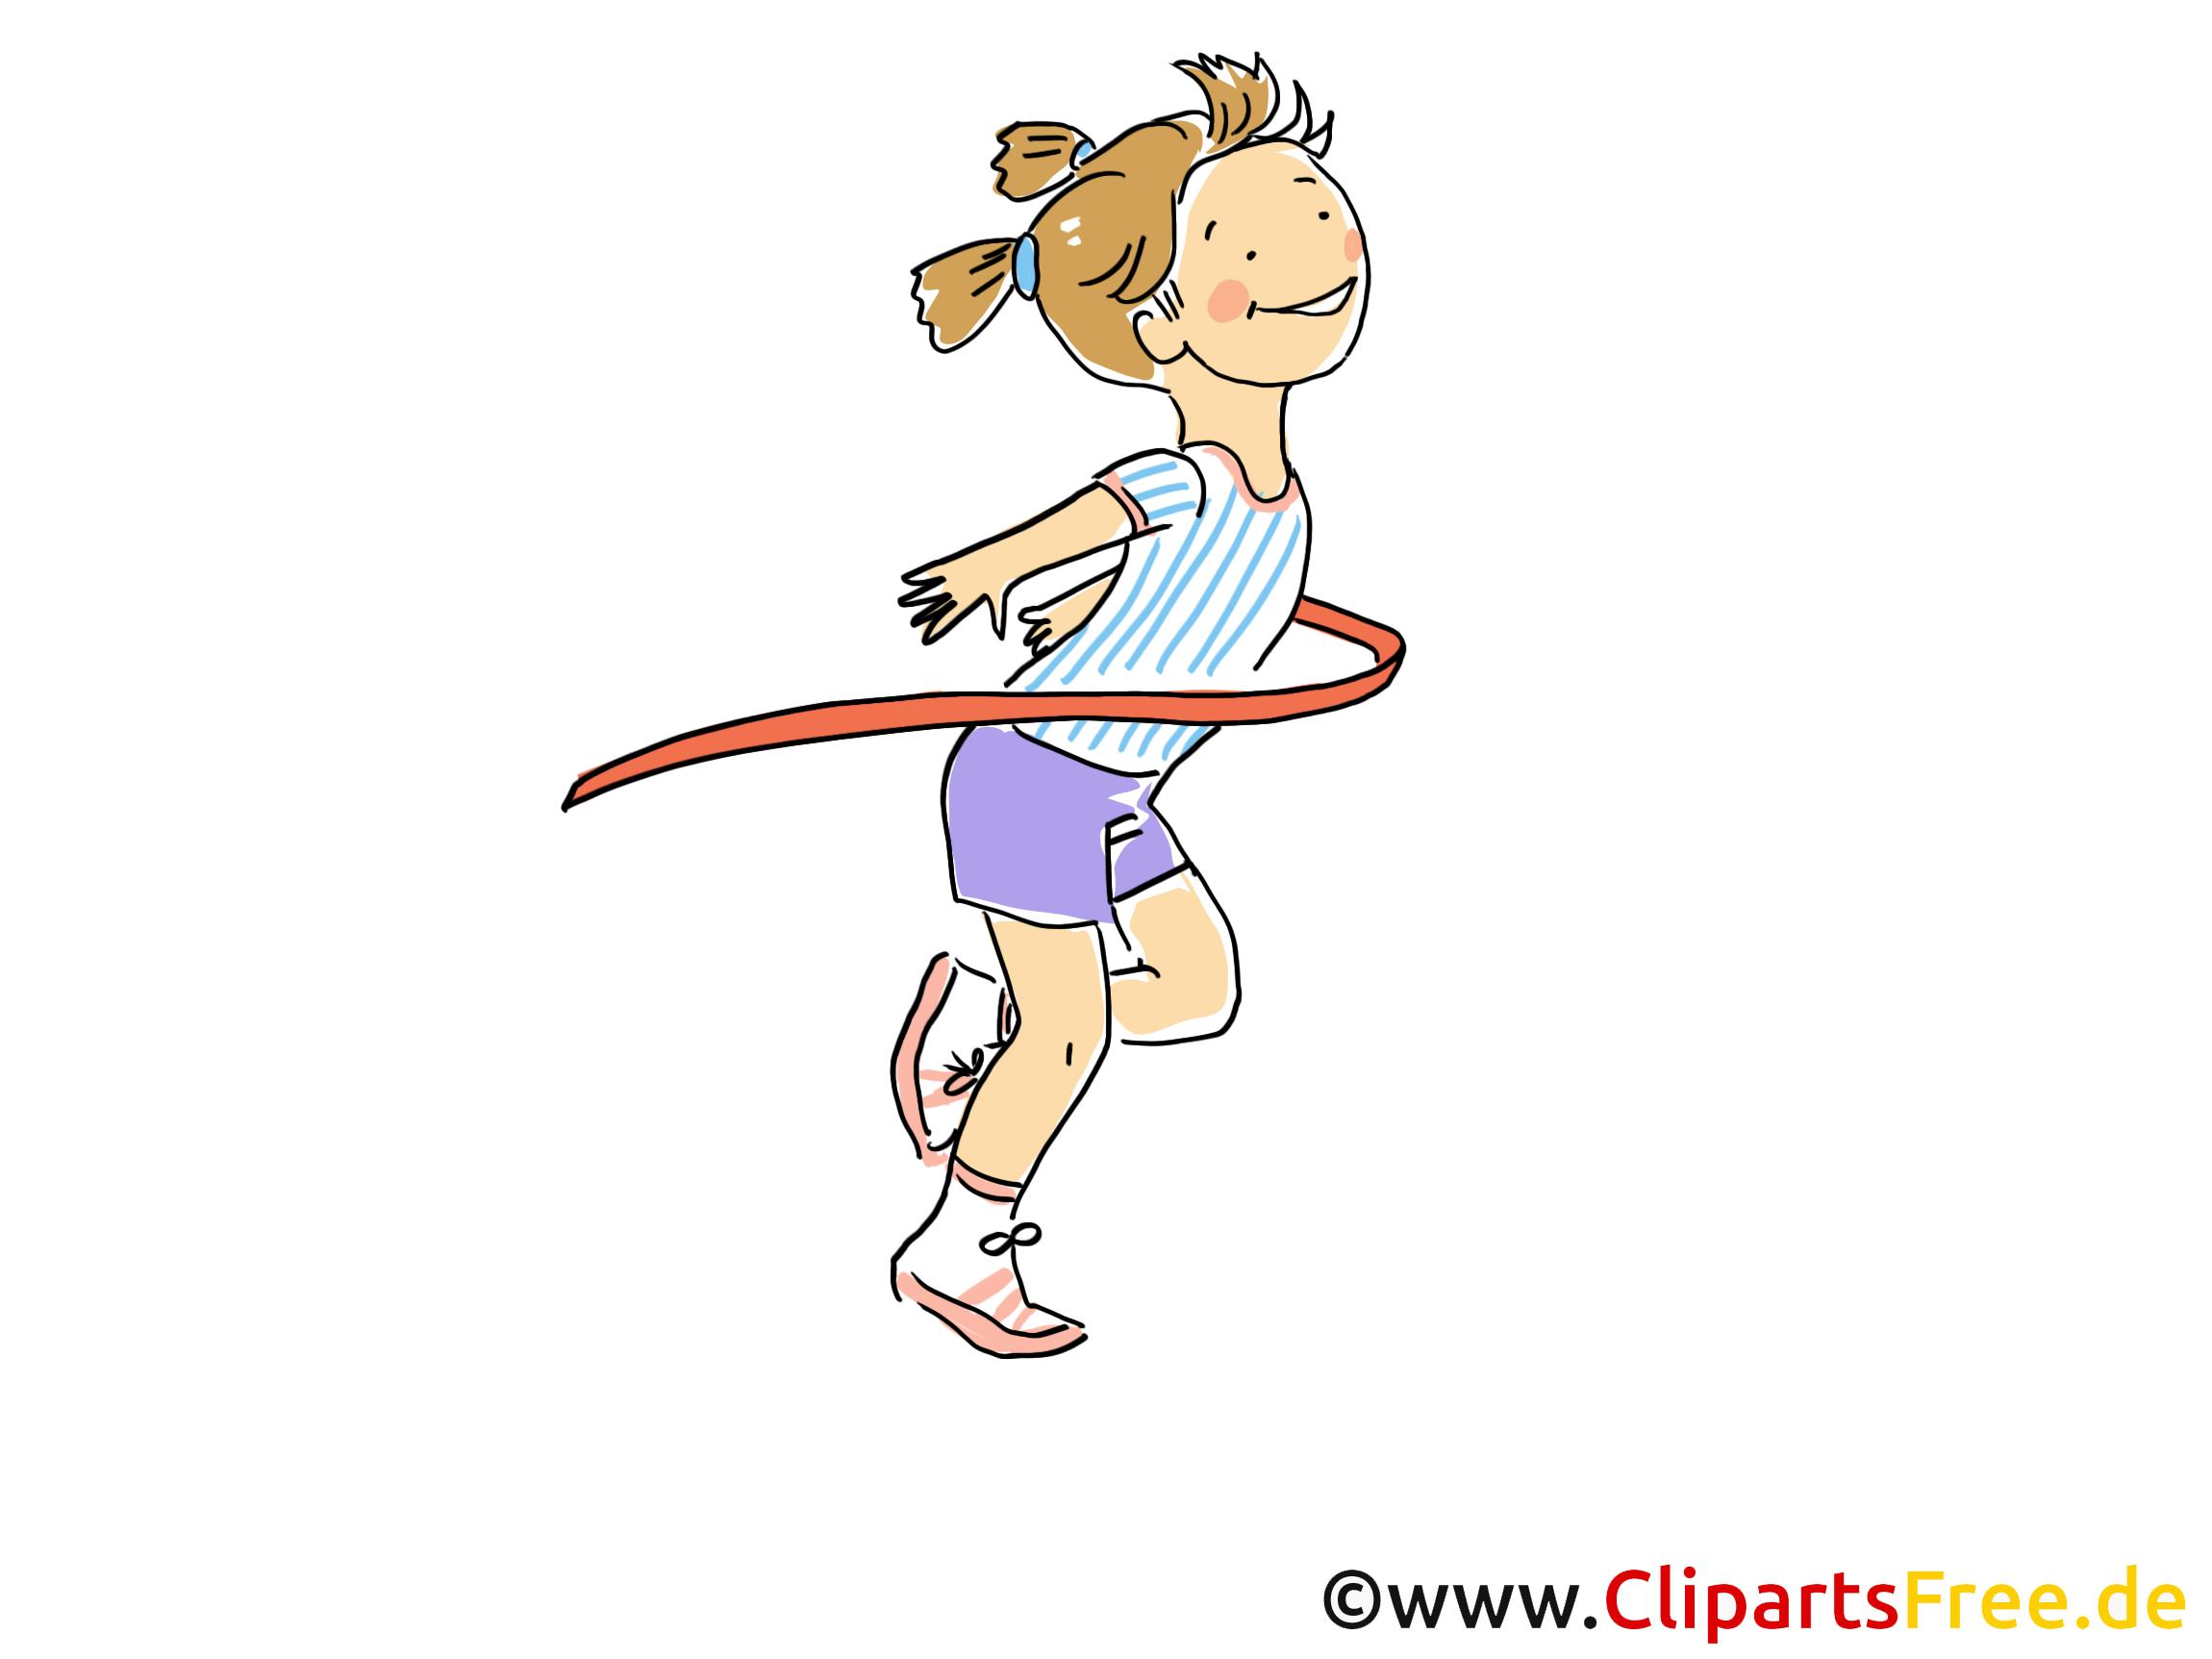 Jogging doelbeeld, clipart, cartoon, cartoon, afbeelding gratis